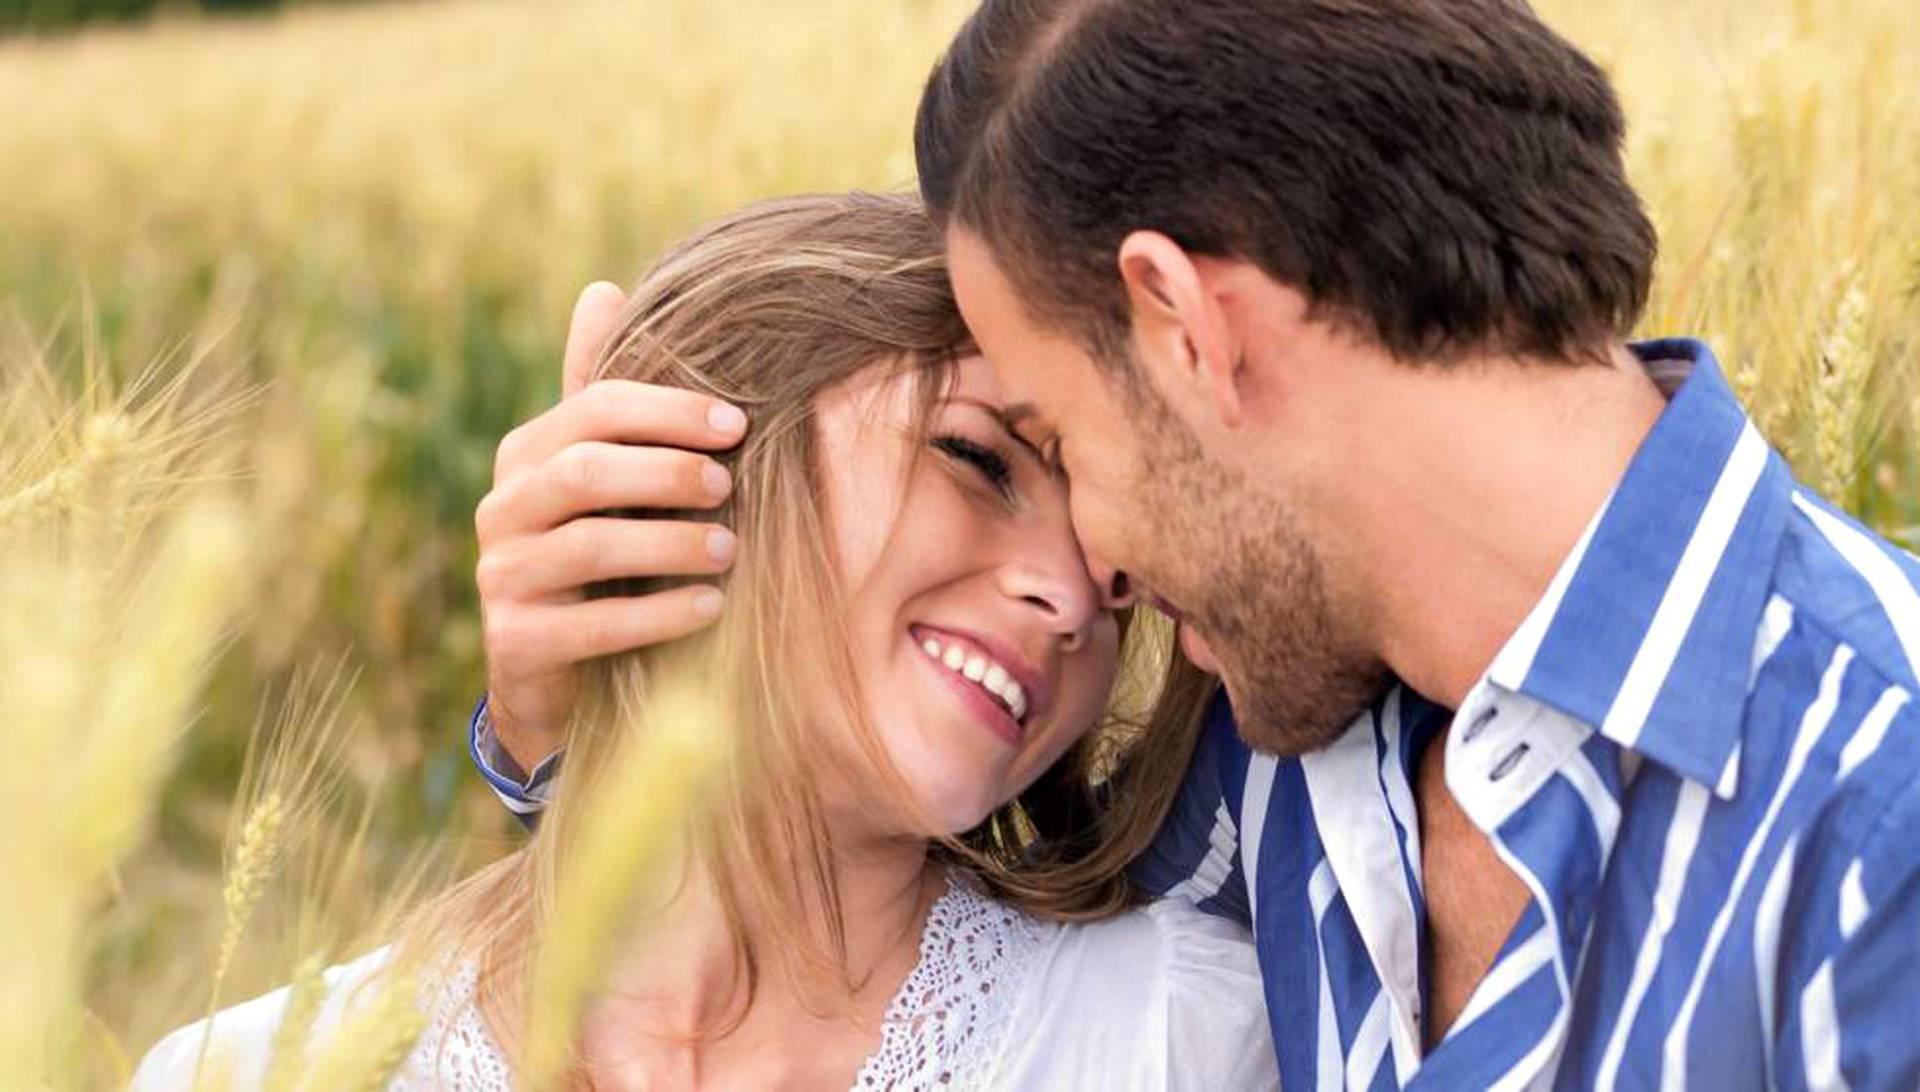 dating yli 40 suhteet